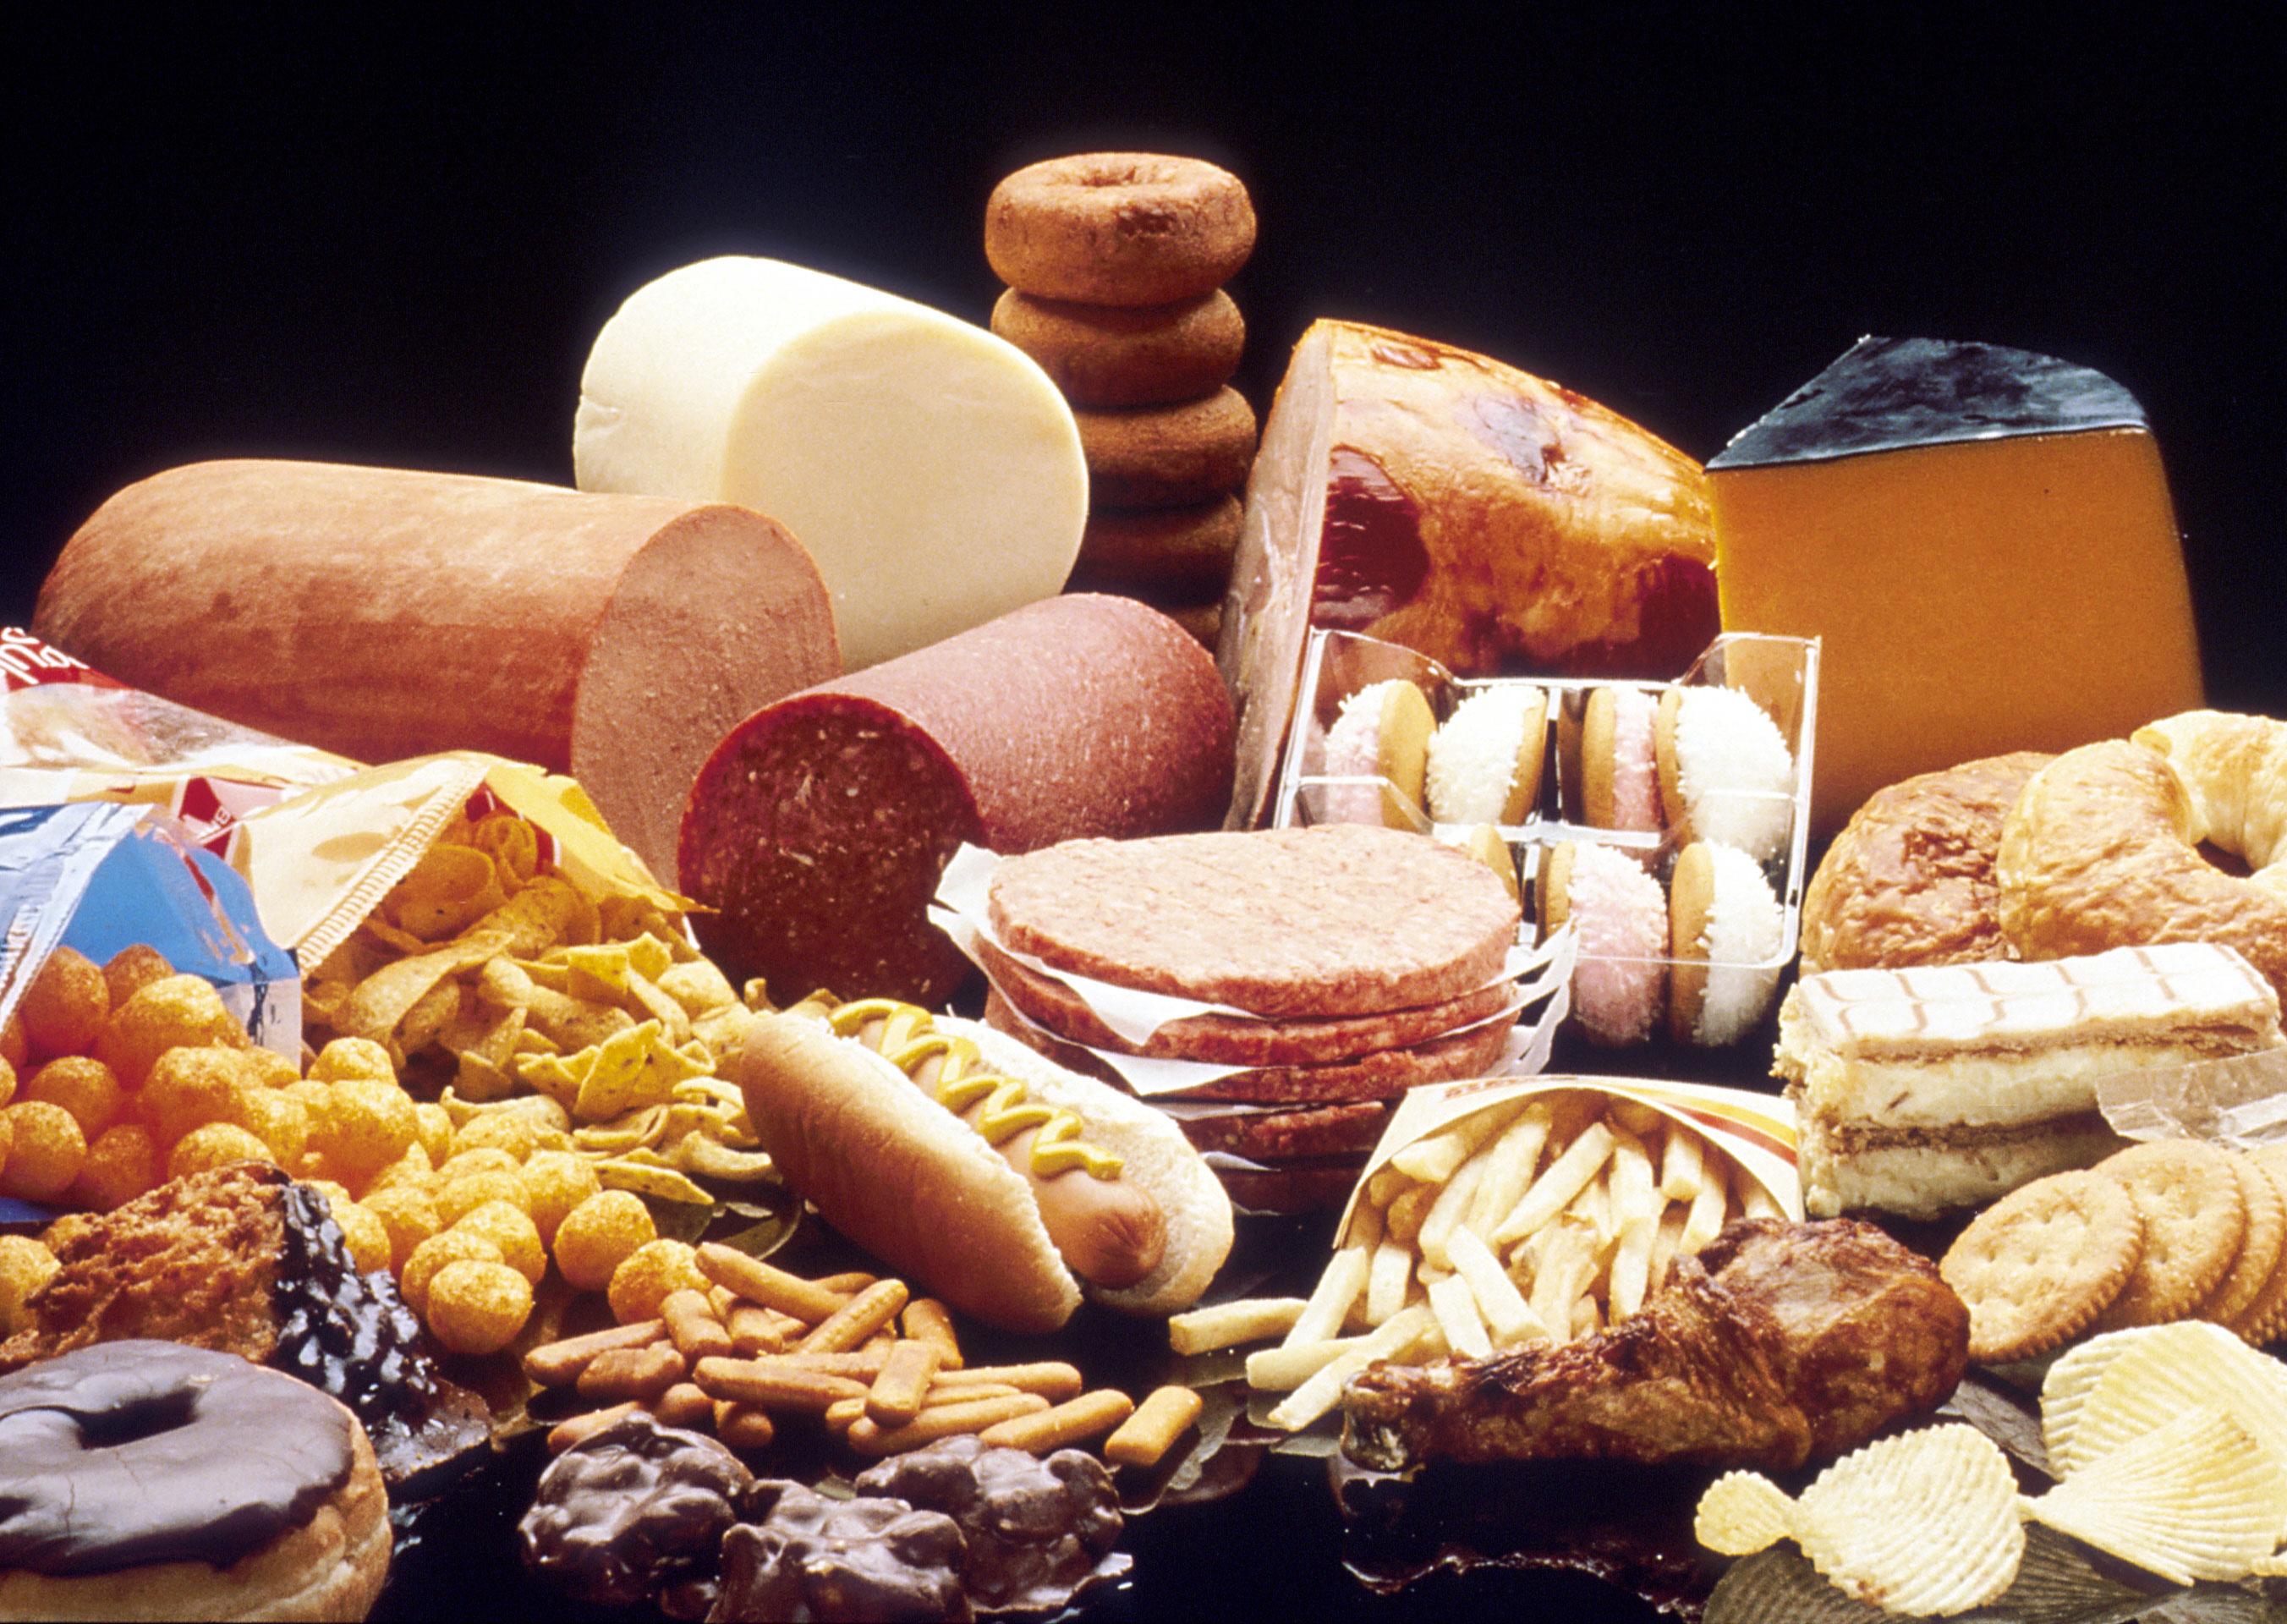 5 jedál, ktoré by nutriční špecialisti nikdy nezjedli